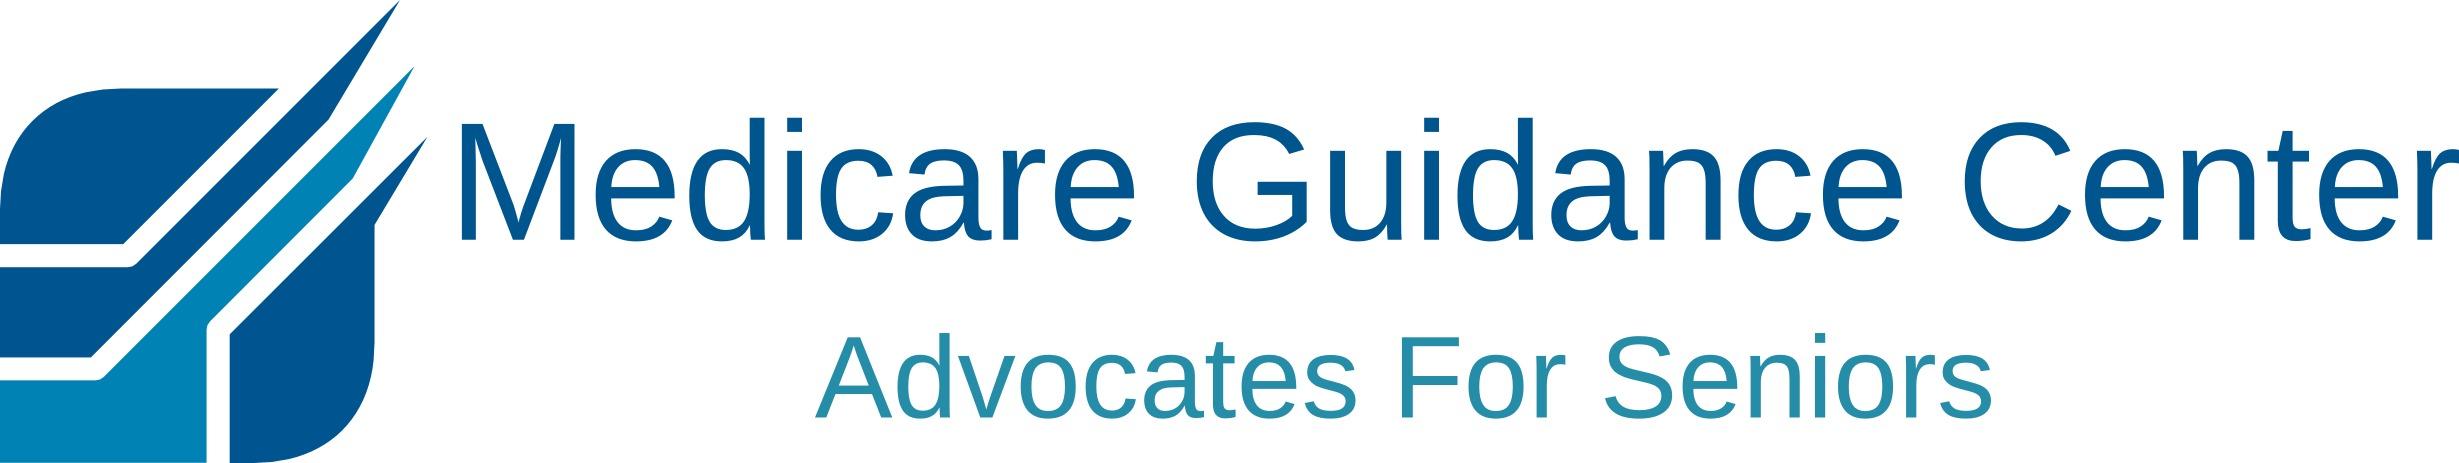 Medicare Guidance Ctr 1